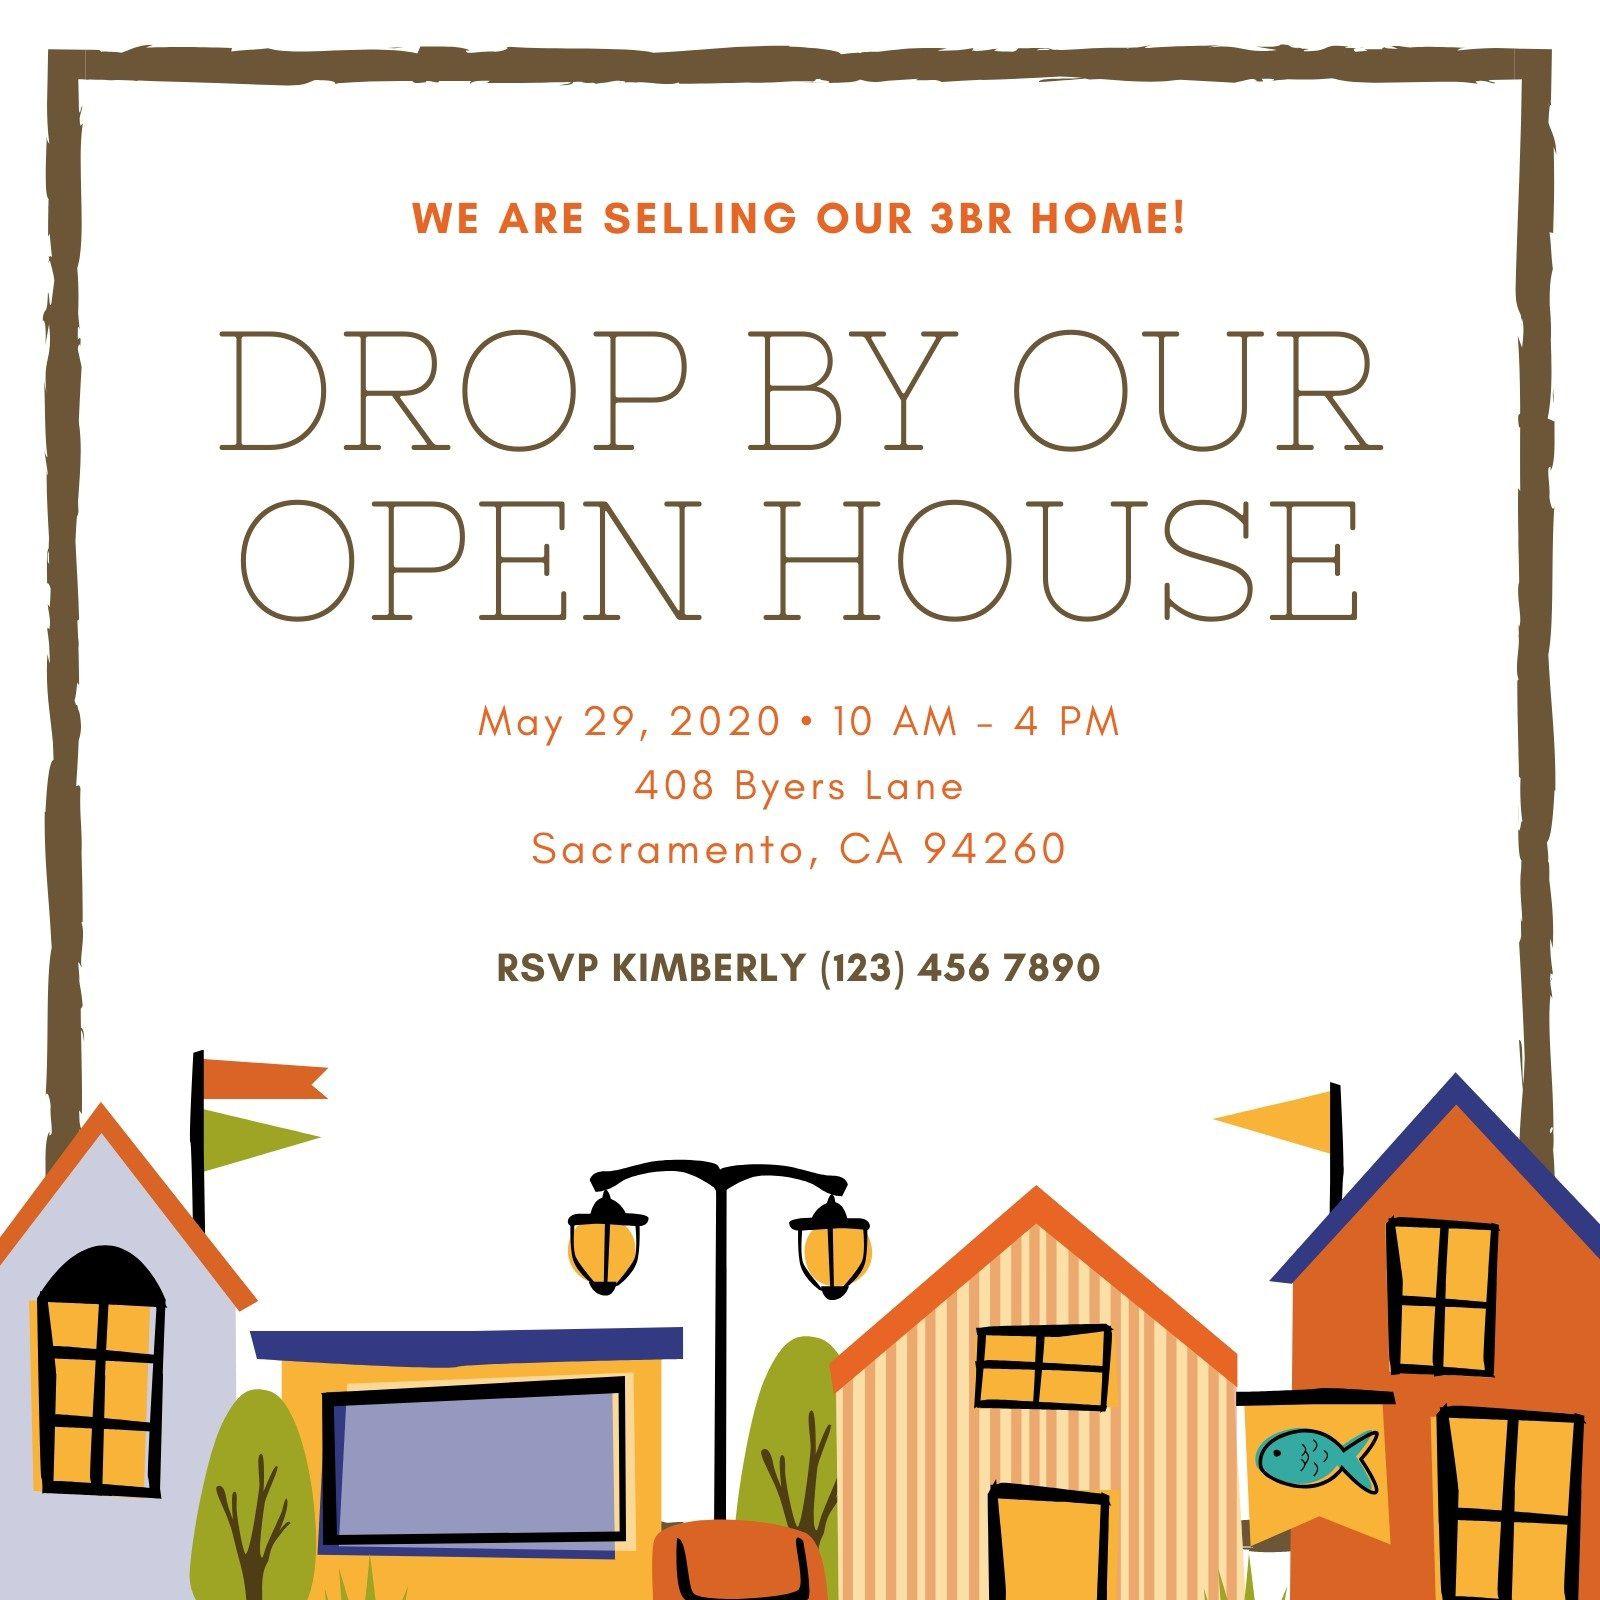 006 Stupendou Open House Invitation Template Design  Templates Free Printable BusinesFull